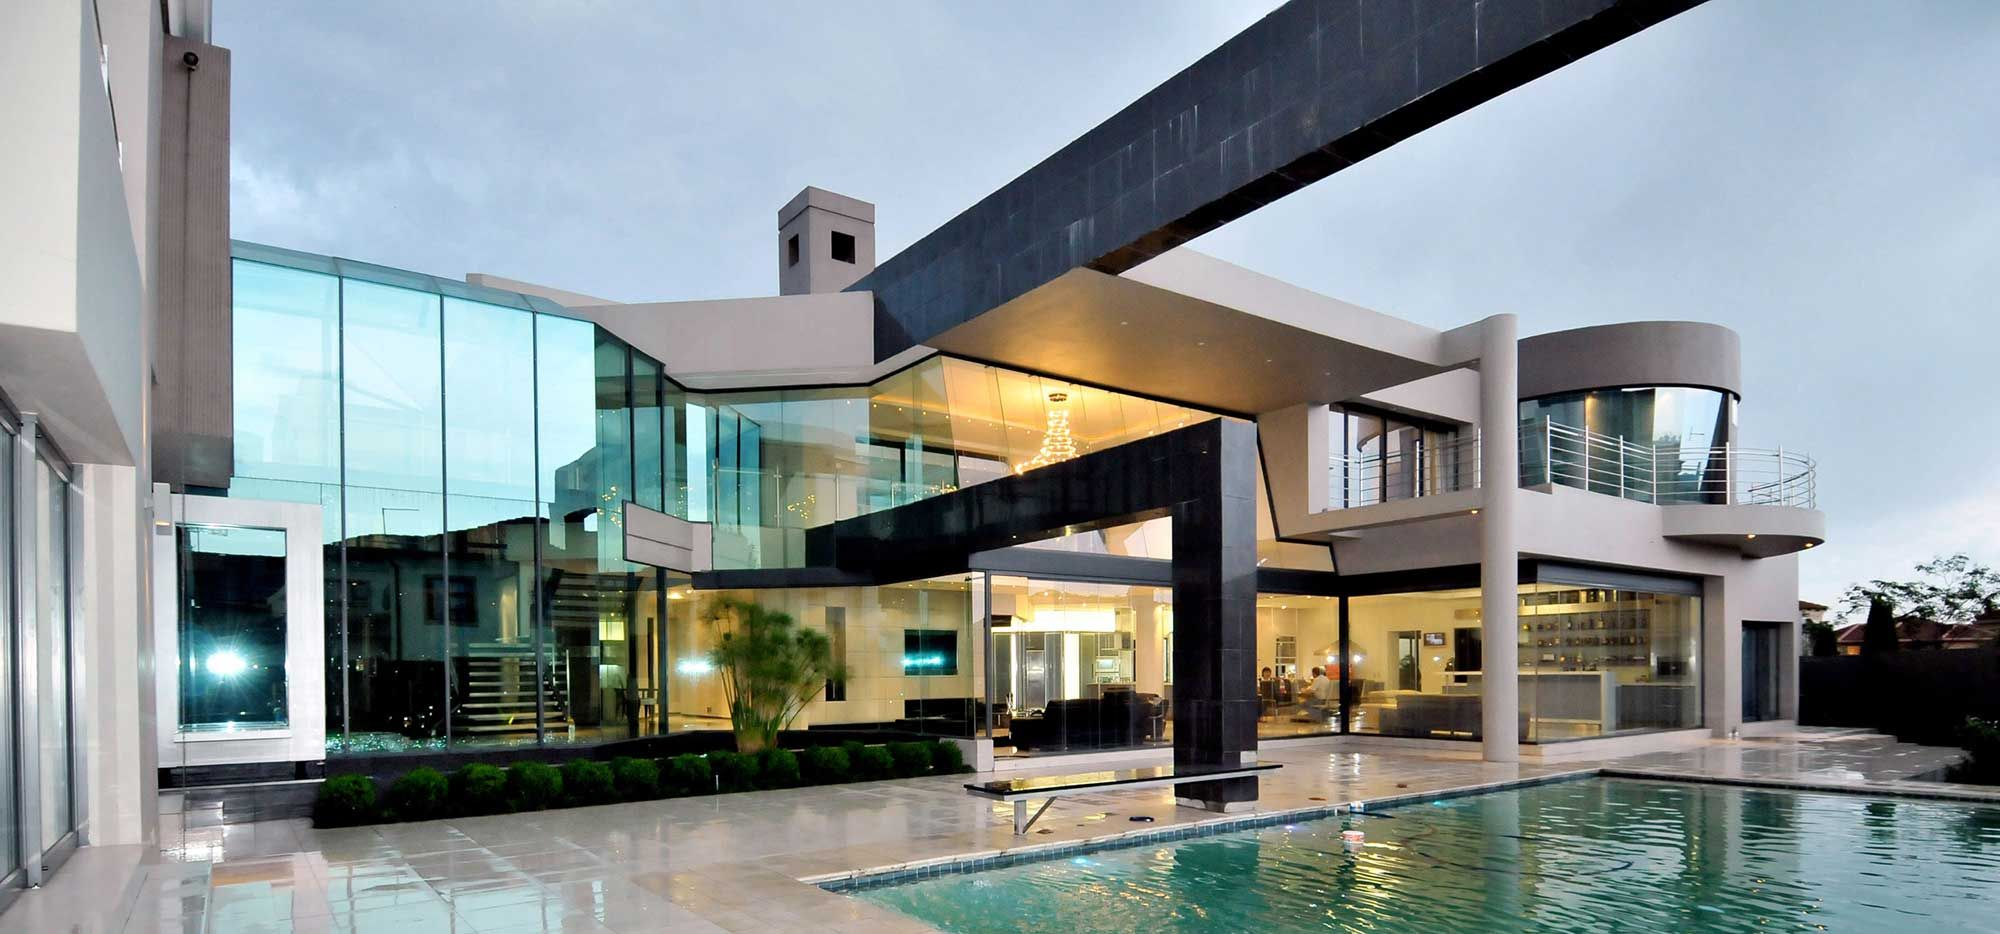 Cal Kempton Park Residence By Nico Van Der Meulen